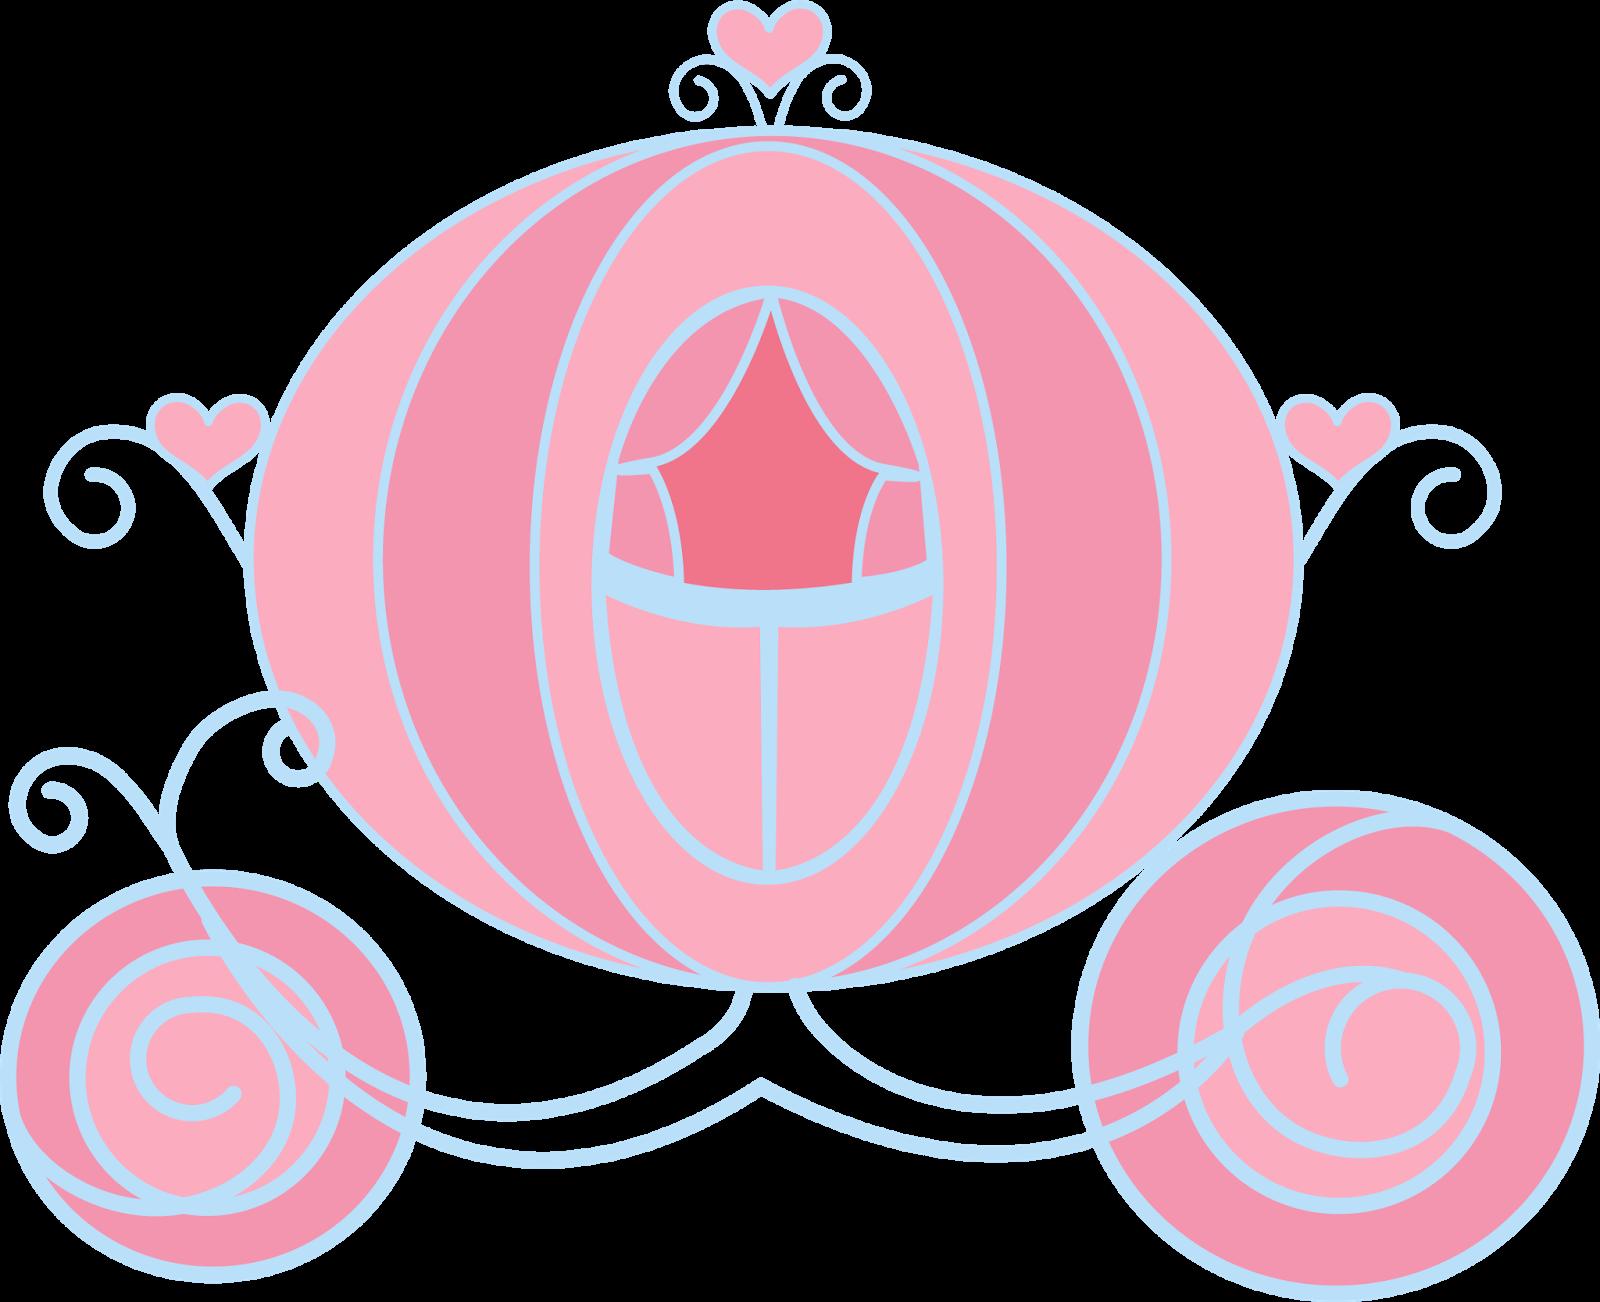 Pumpkin Birthday Invitations is nice invitation design